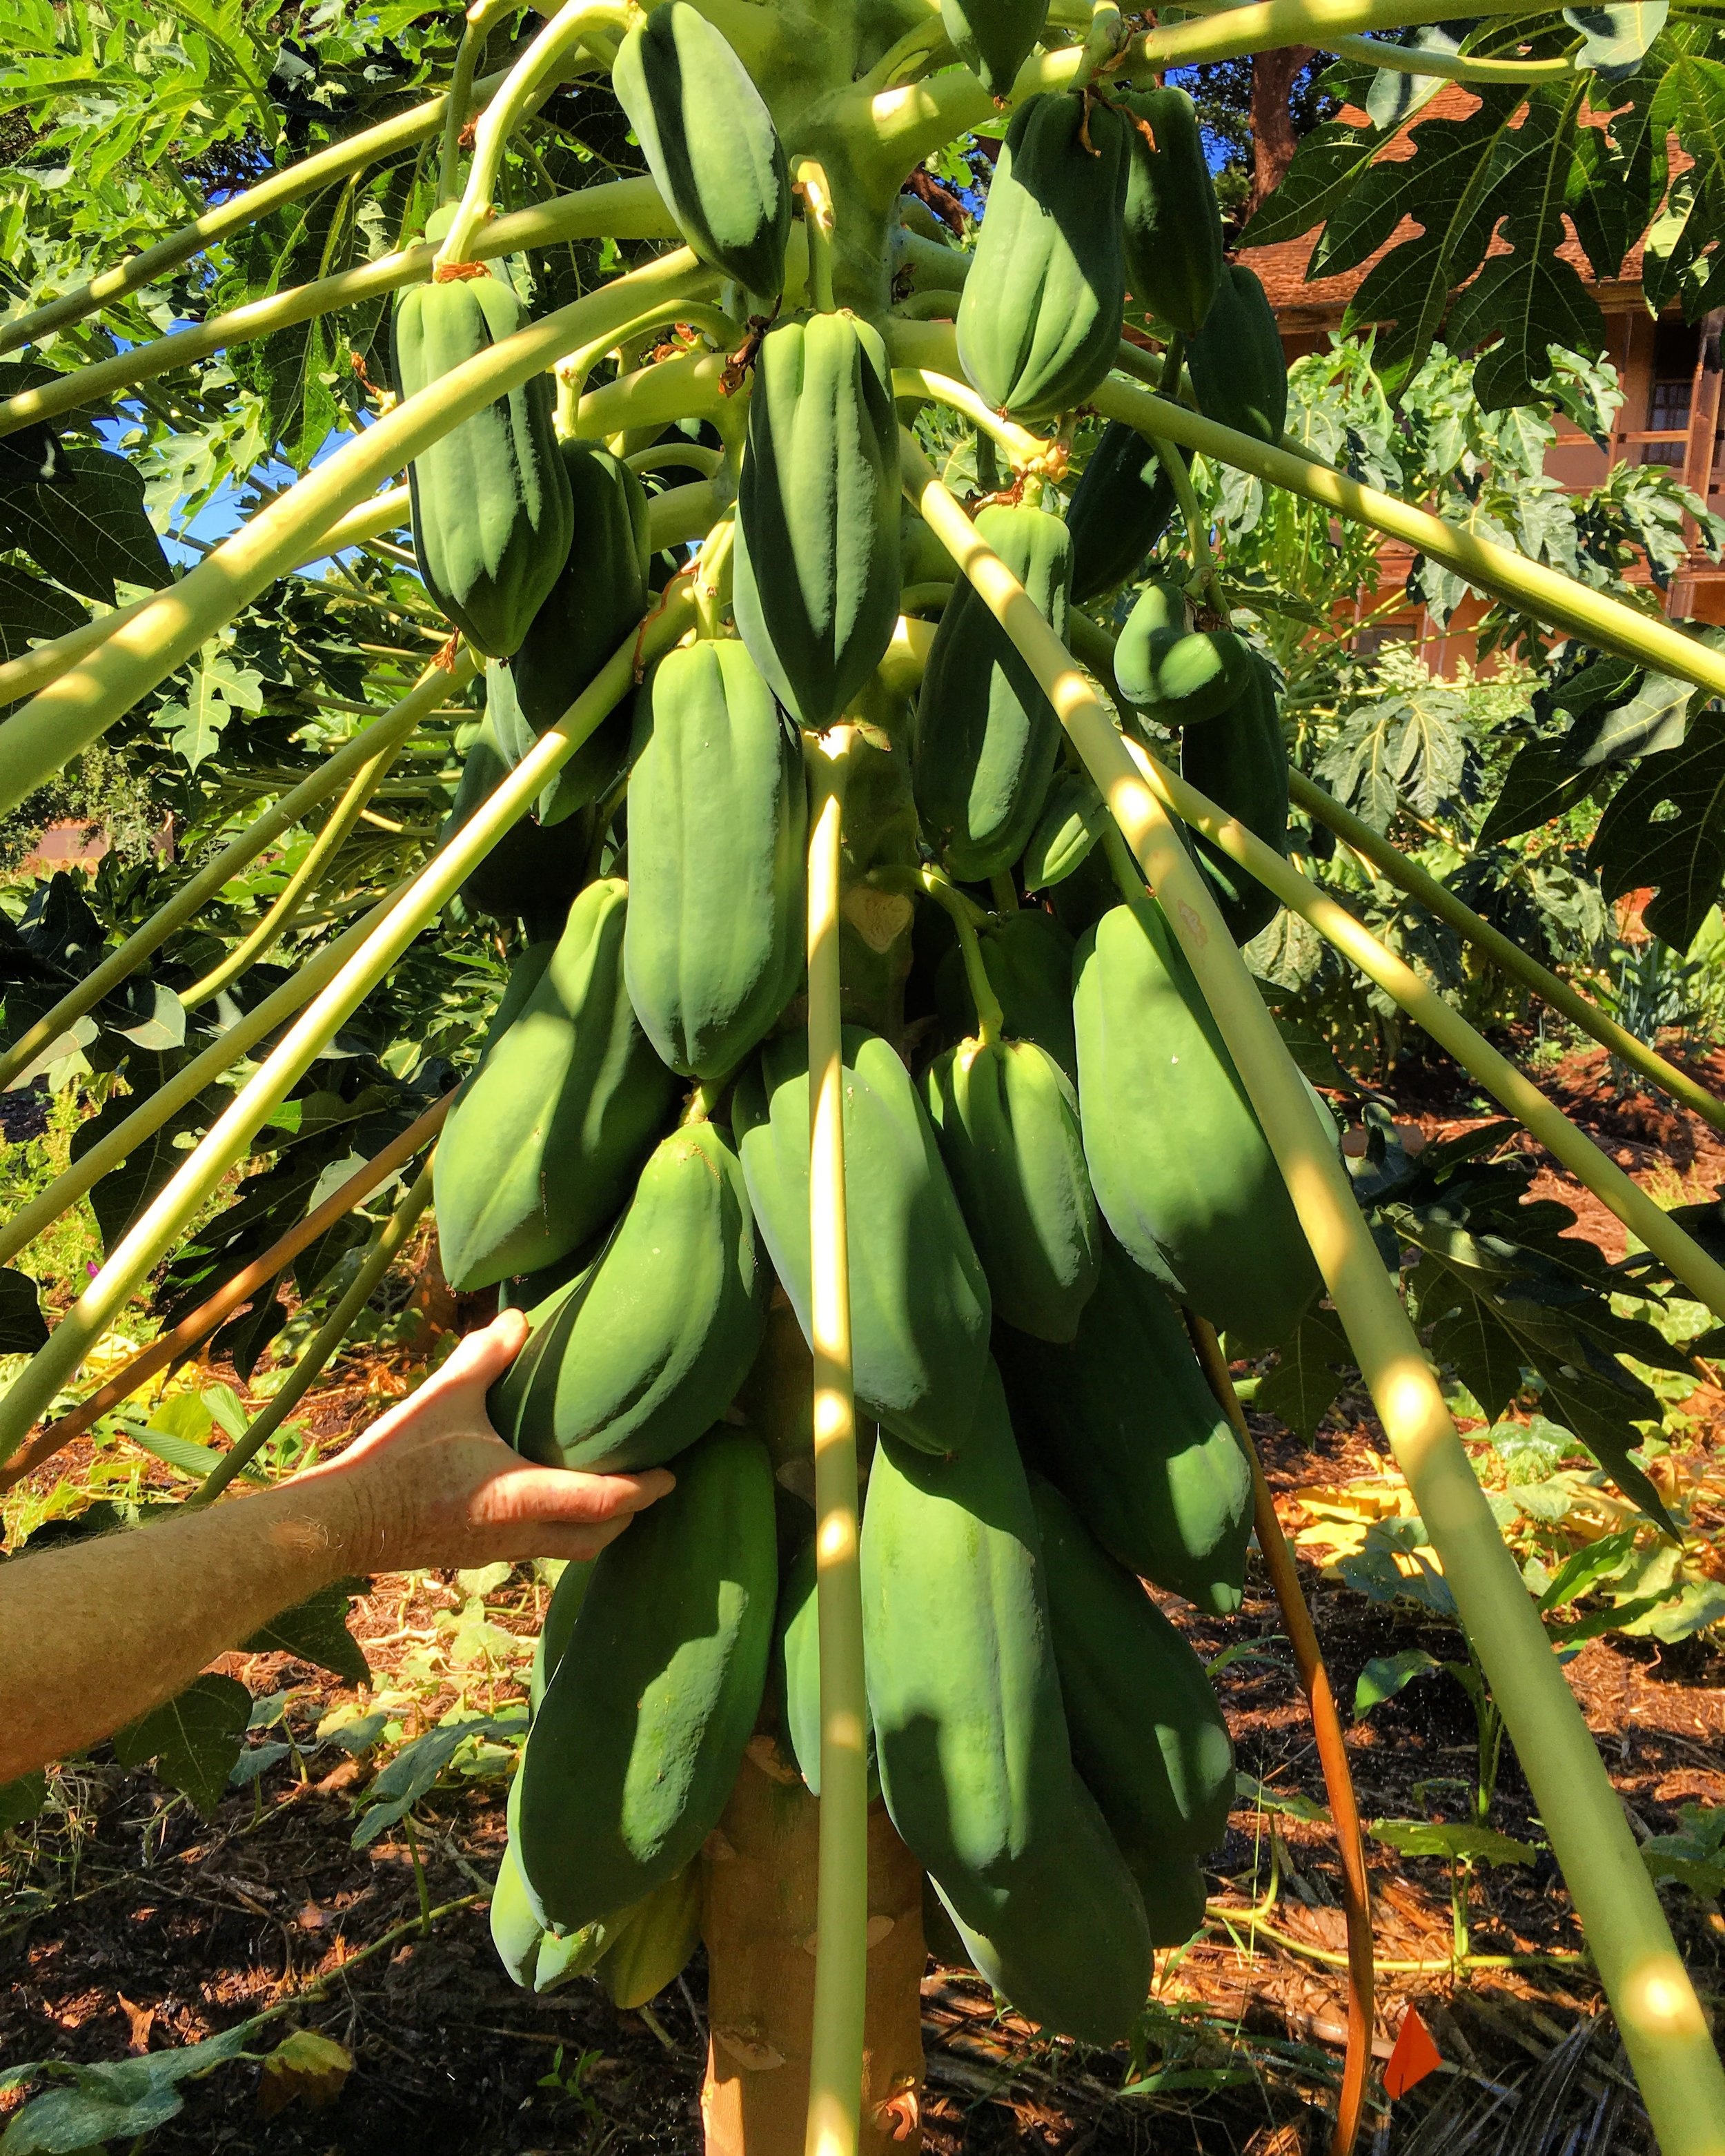 Giant Papayas!